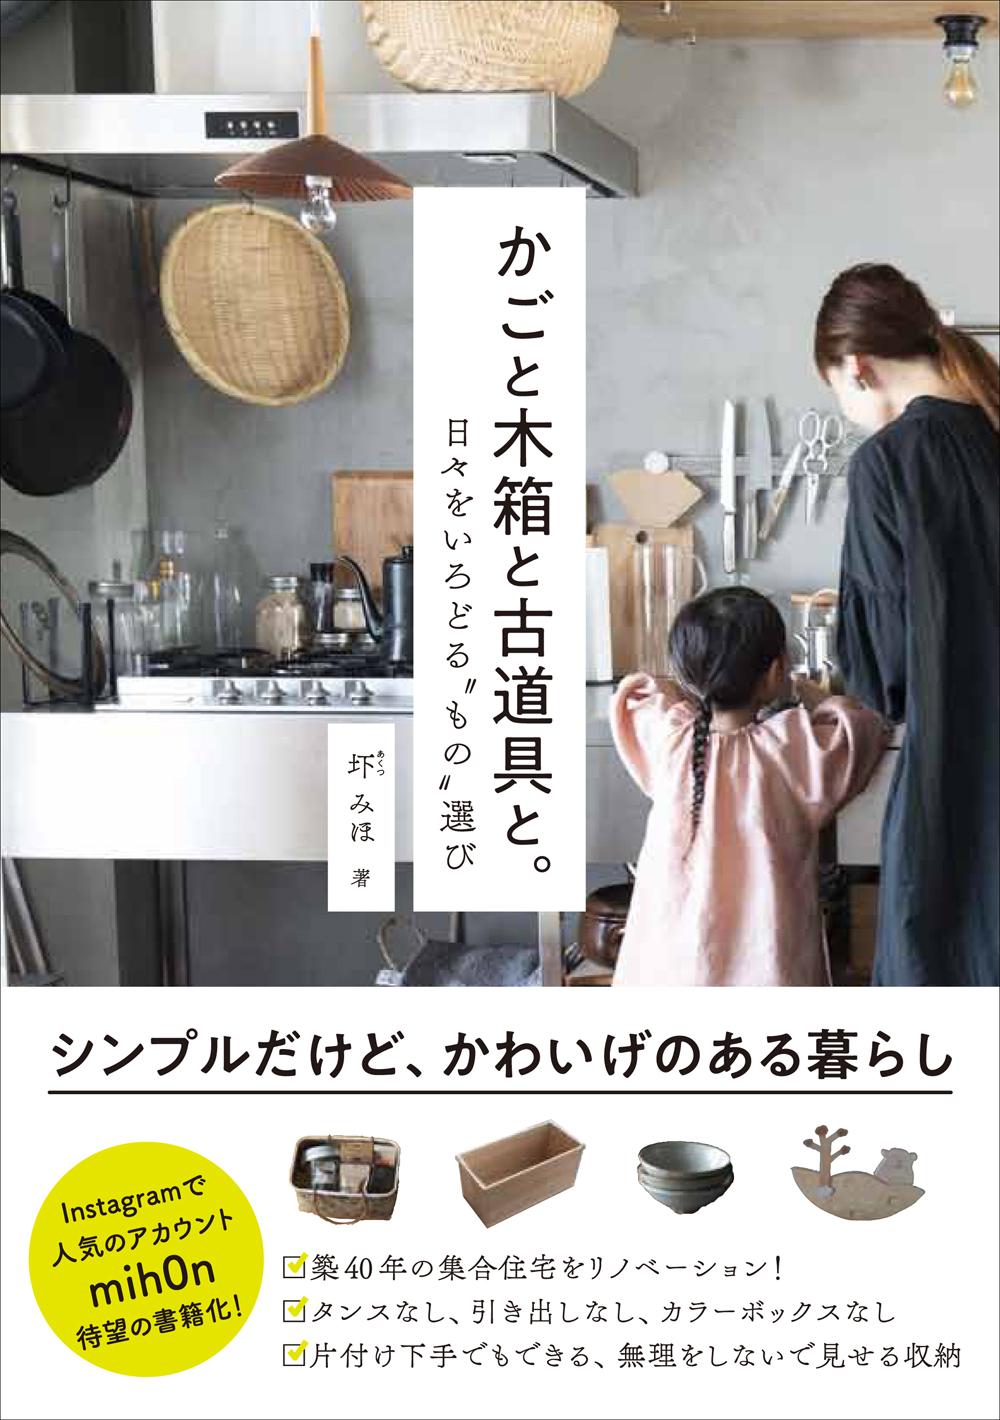 098-H1-ariko.jpg